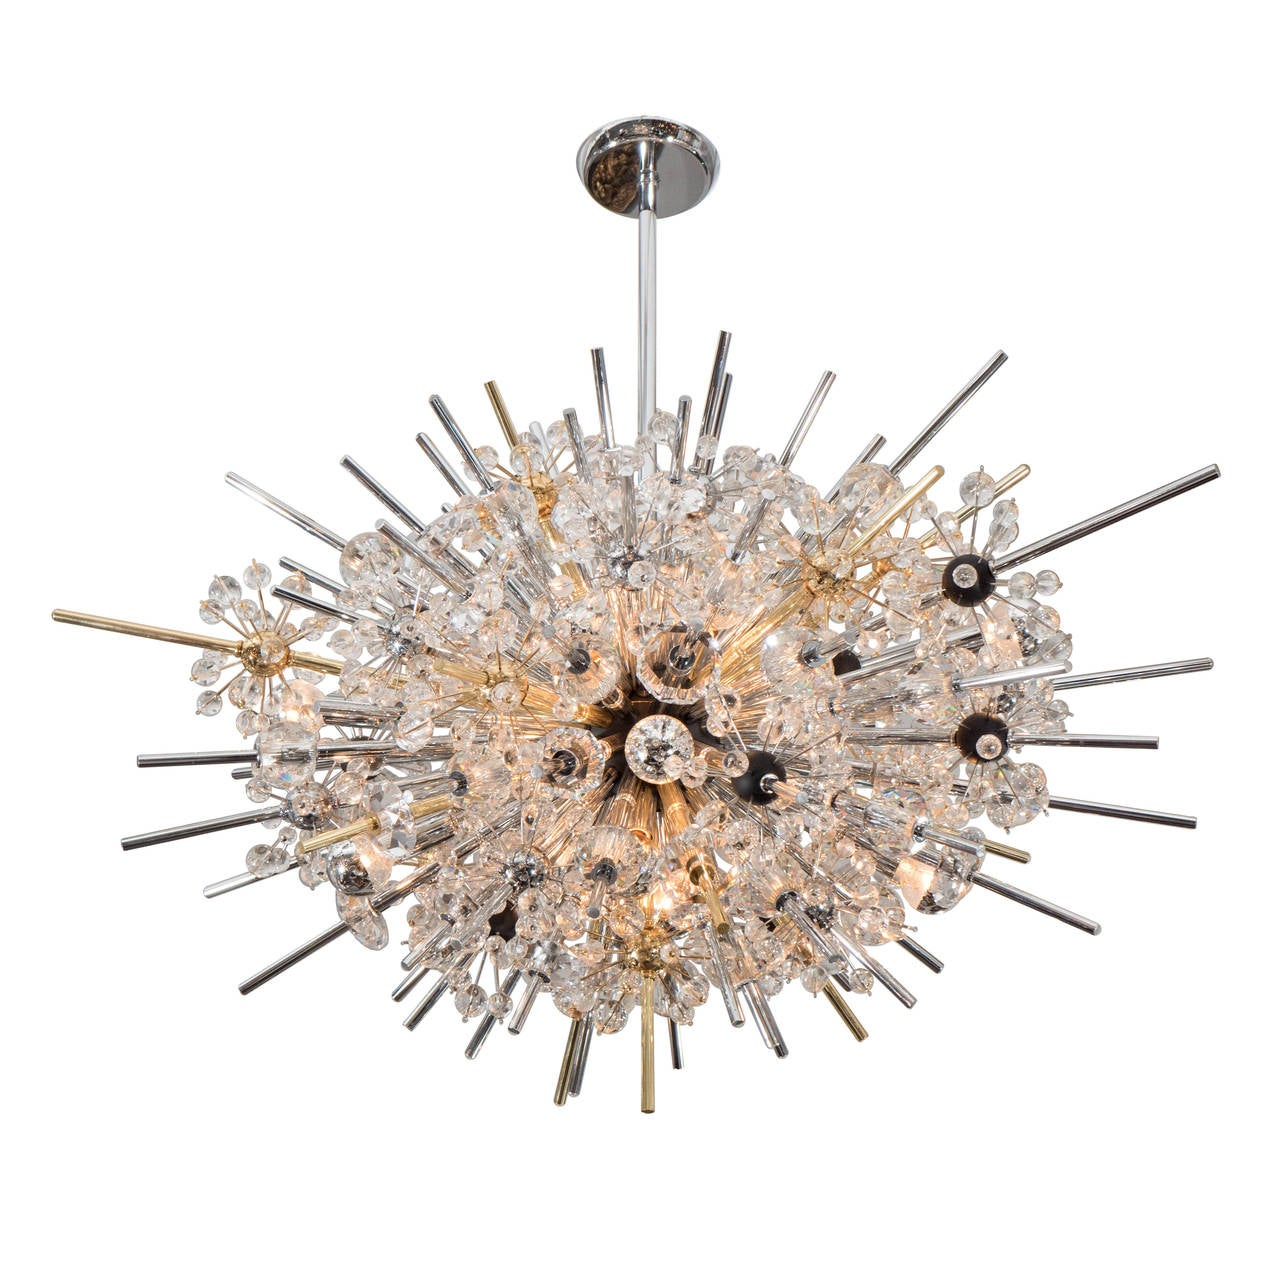 Crystal Sputnik with Brass and Polished Nickel Frame